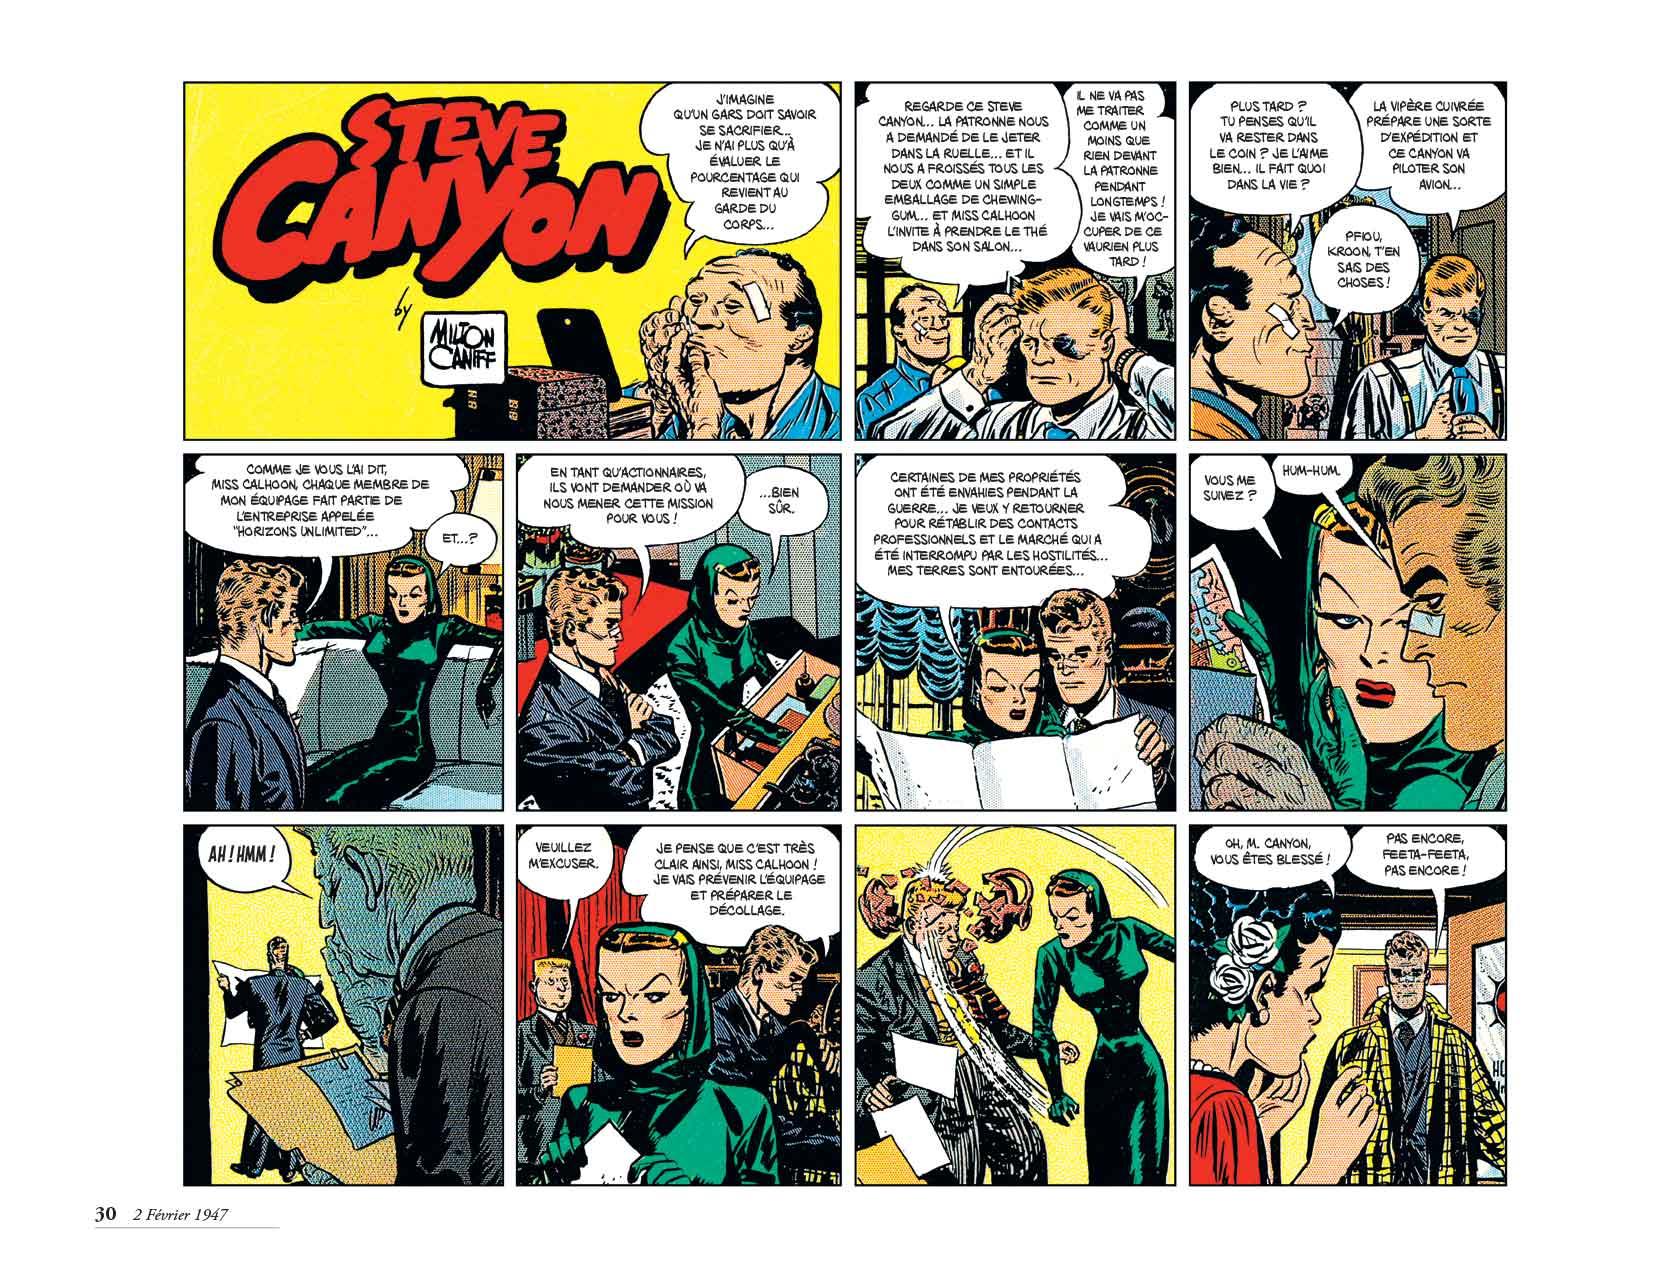 STEVE-CANYON-sample-14A